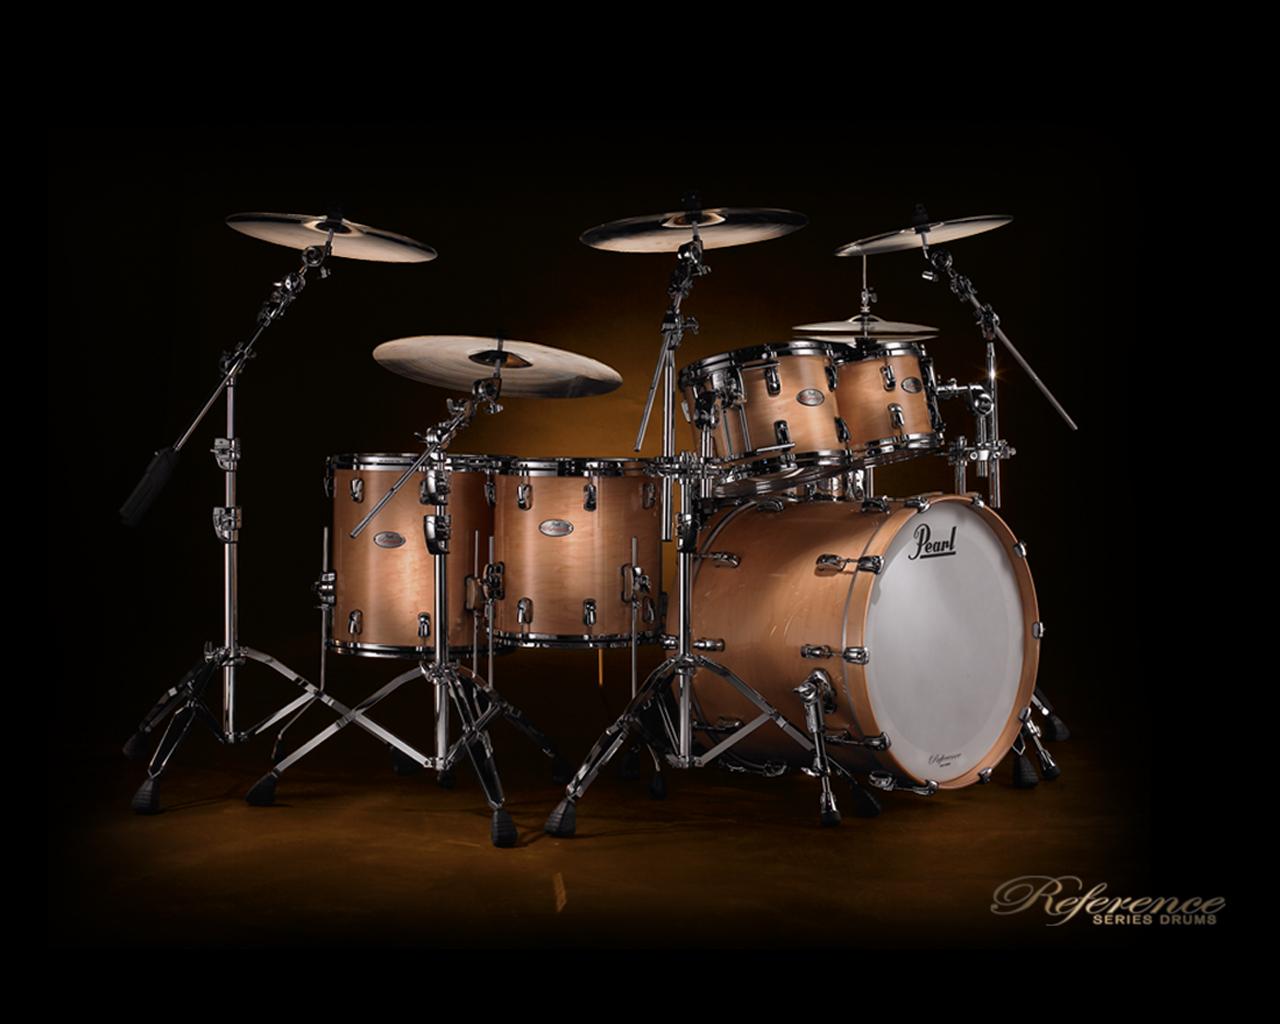 67629Pearl Classic Drum HD wallpaper   Pearl Classic Drum 1280x1024